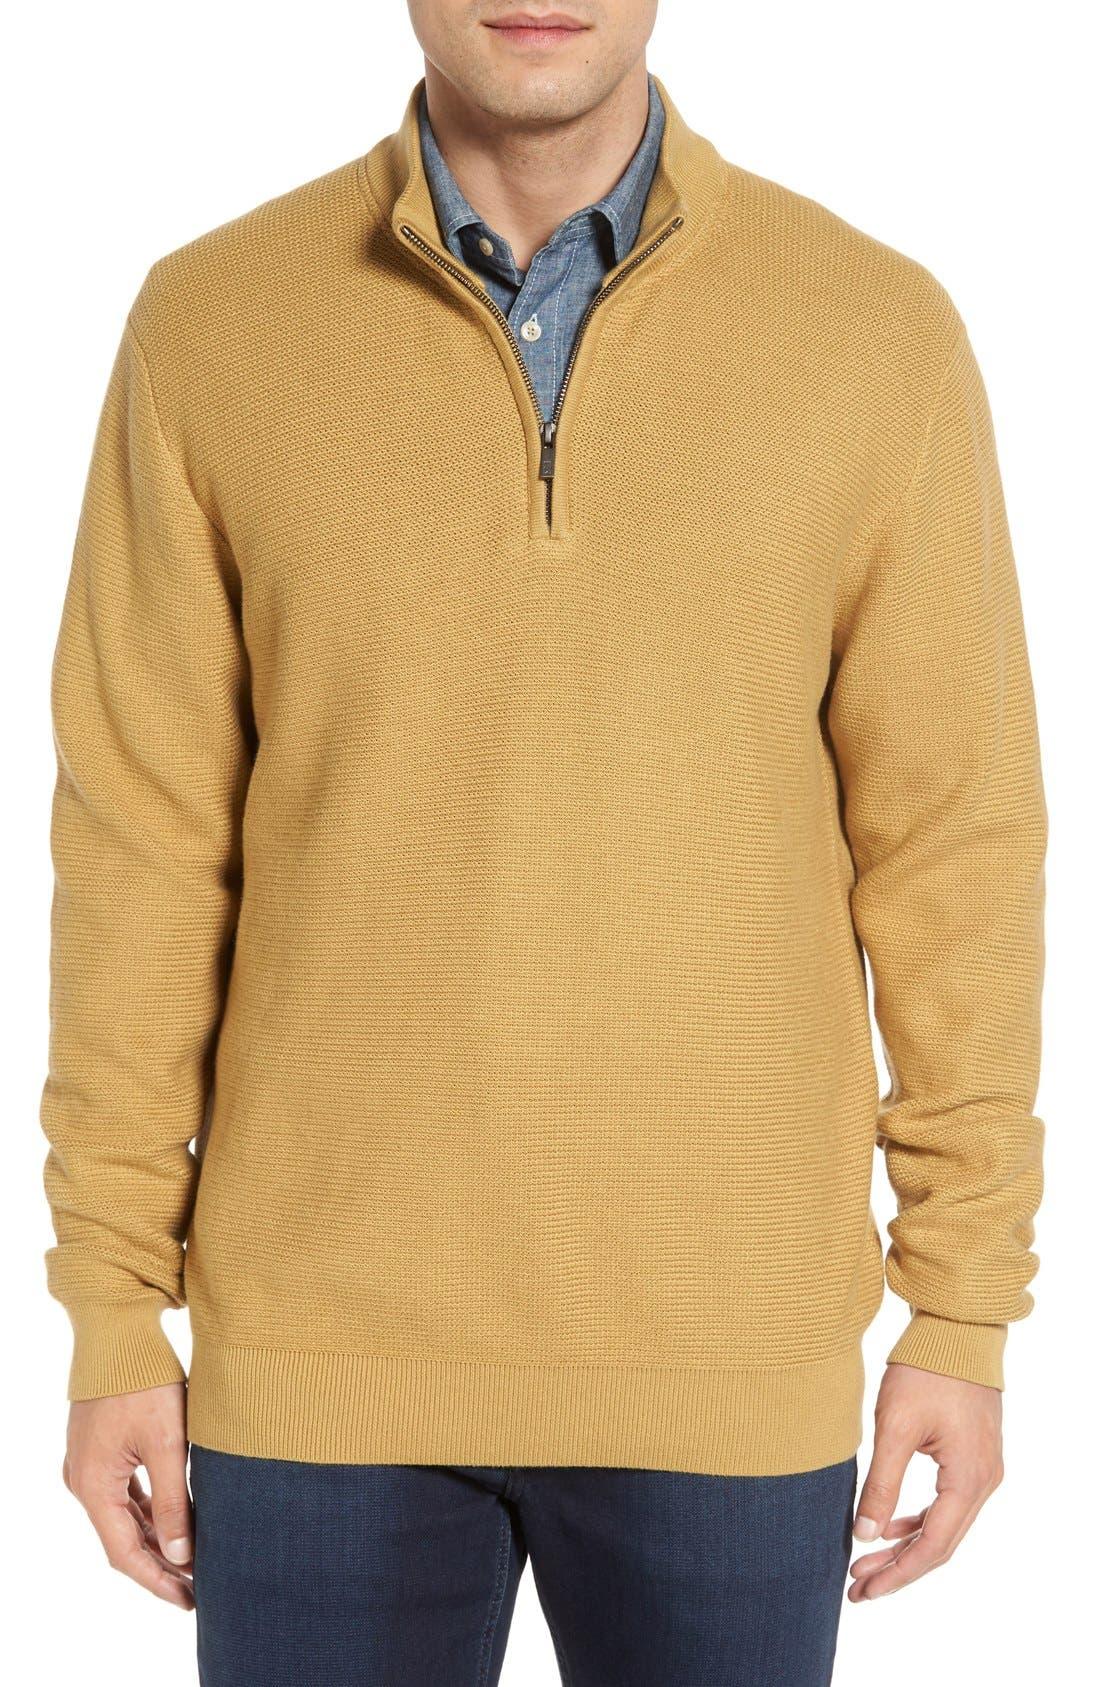 'Benson' Quarter Zip Textured Knit Sweater,                             Main thumbnail 3, color,